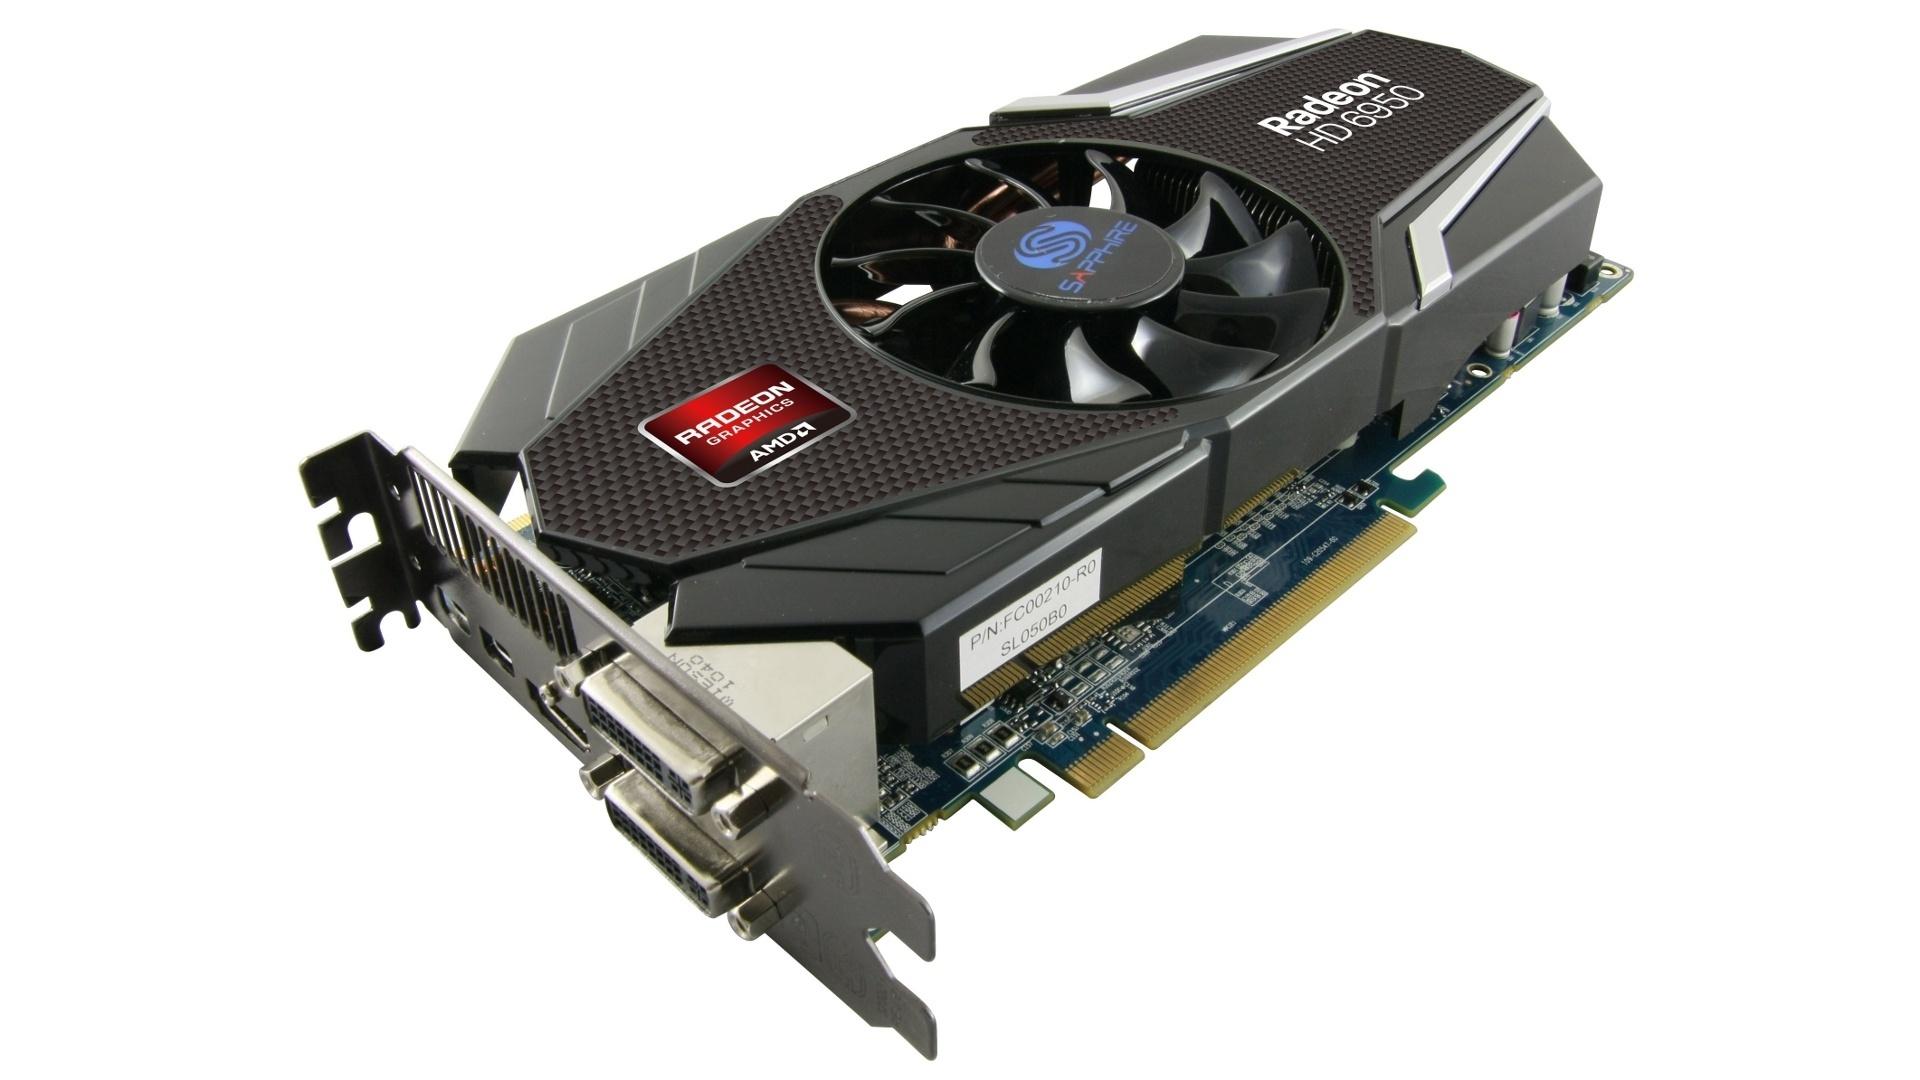 Sapphire Radeon HD 6950 1,0 GByte